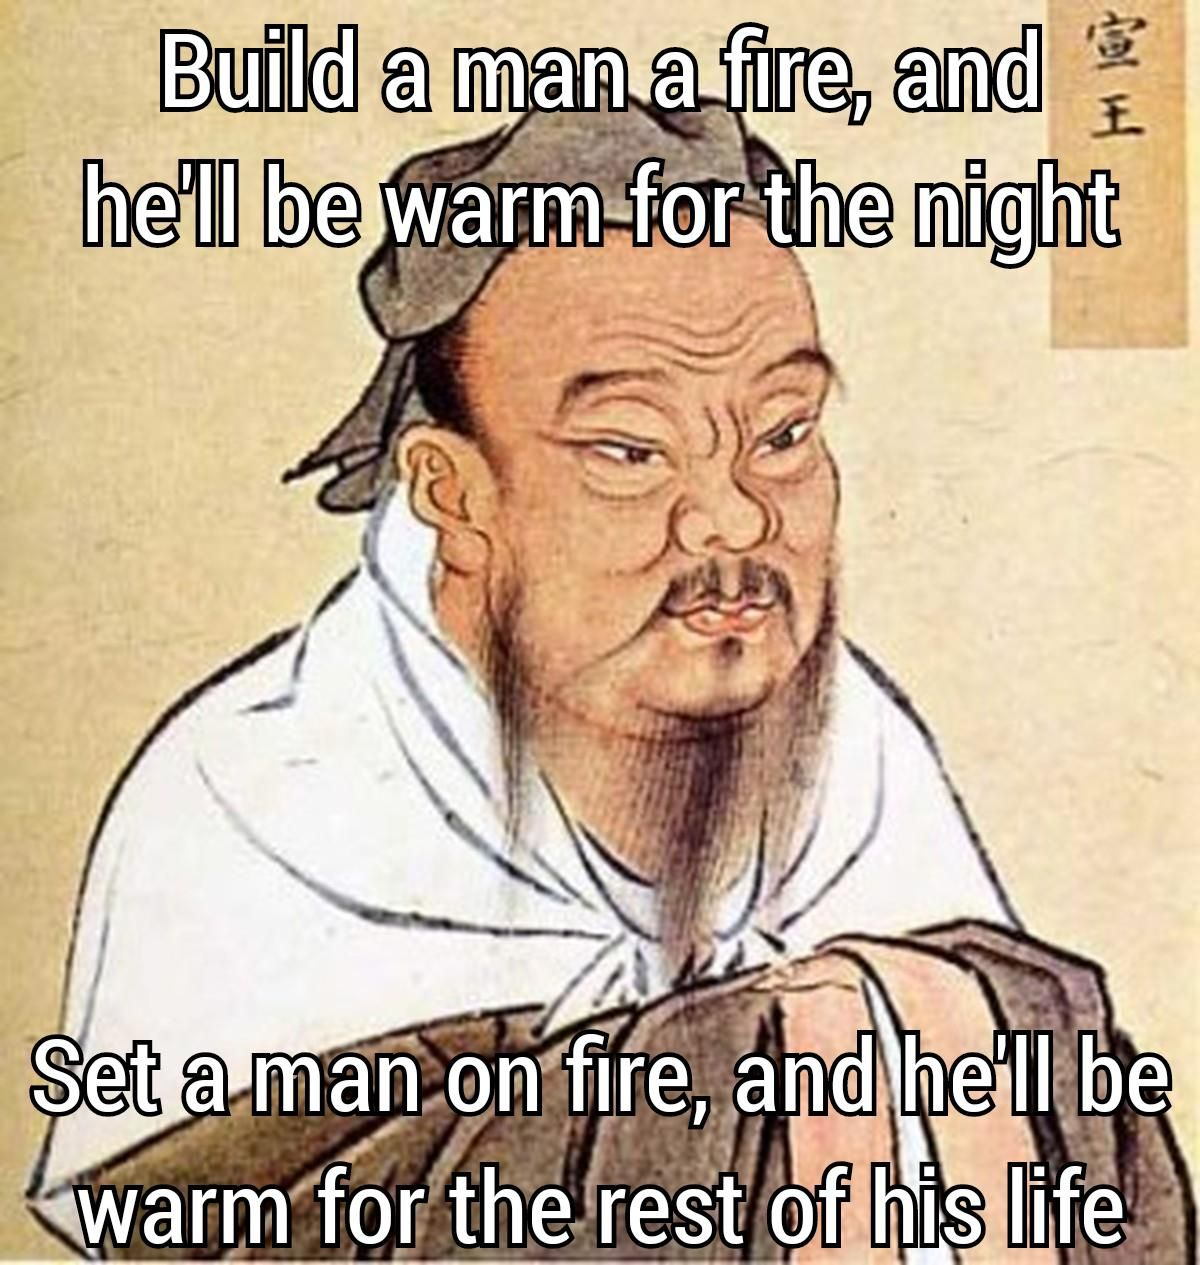 Thanks, Confucius. That's a good wisdom